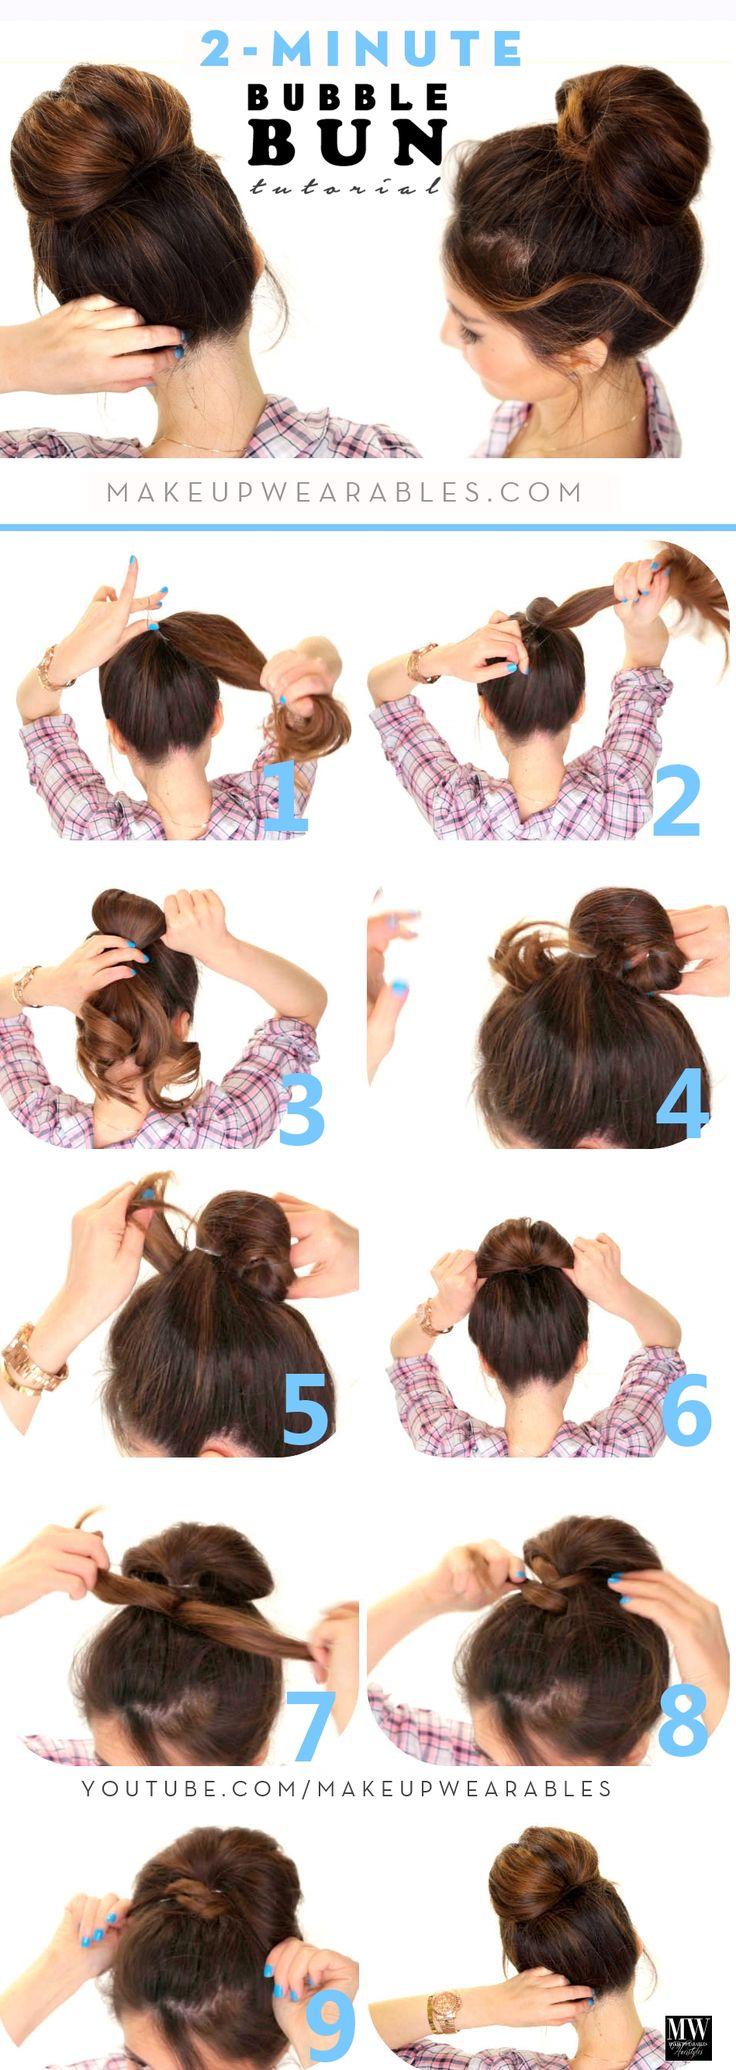 Wondrous 1000 Ideas About Fan Bun On Pinterest Cute Girls Hairstyles Short Hairstyles Gunalazisus